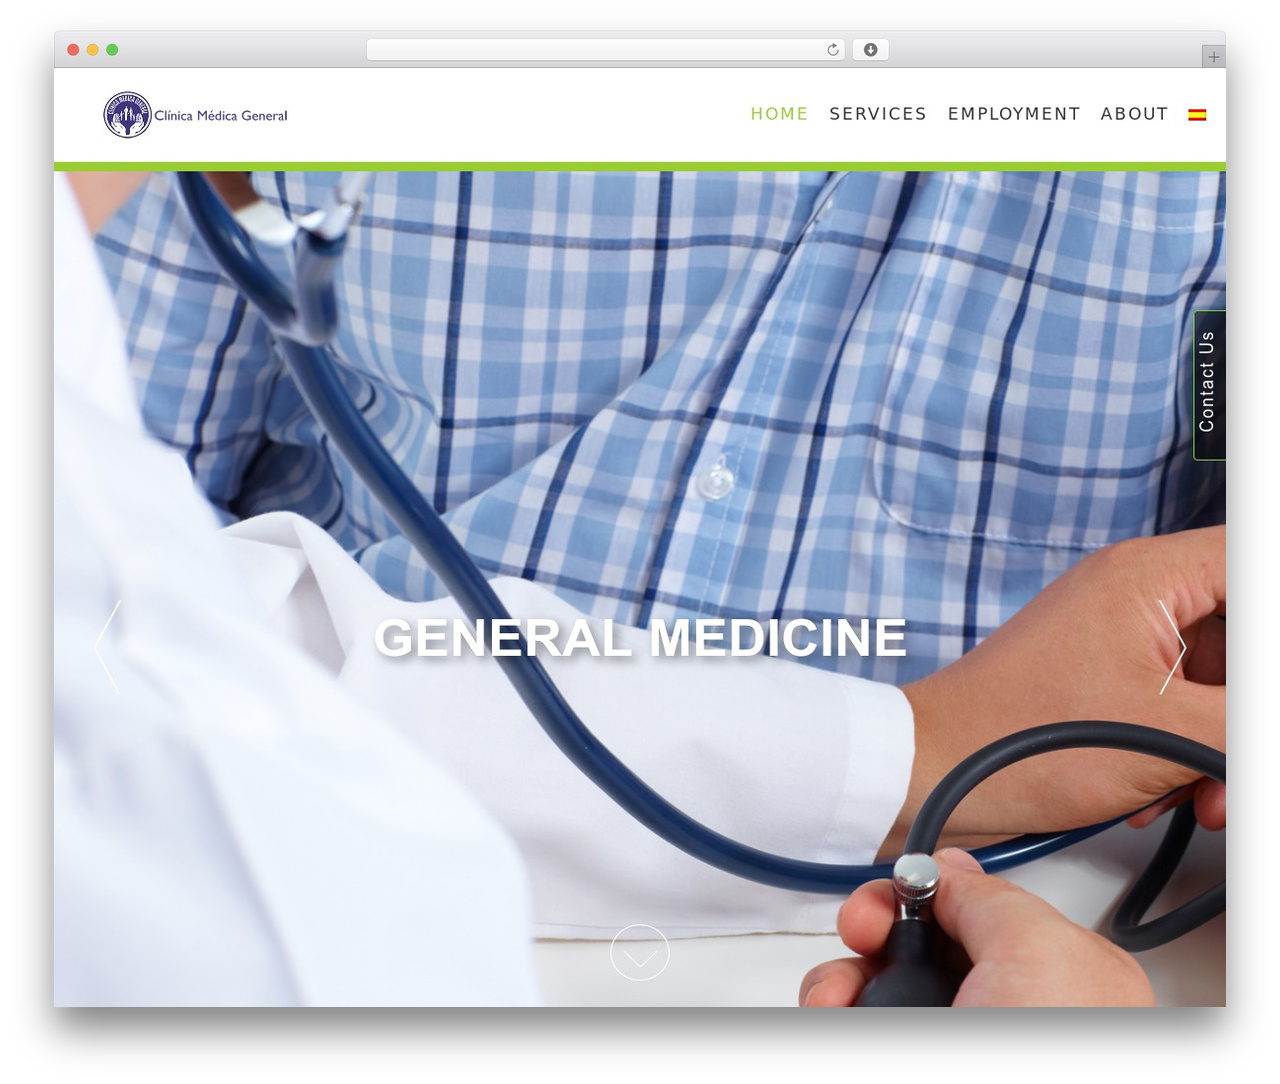 AccessPress Parallax free WP theme - clinicadrdaniel.com